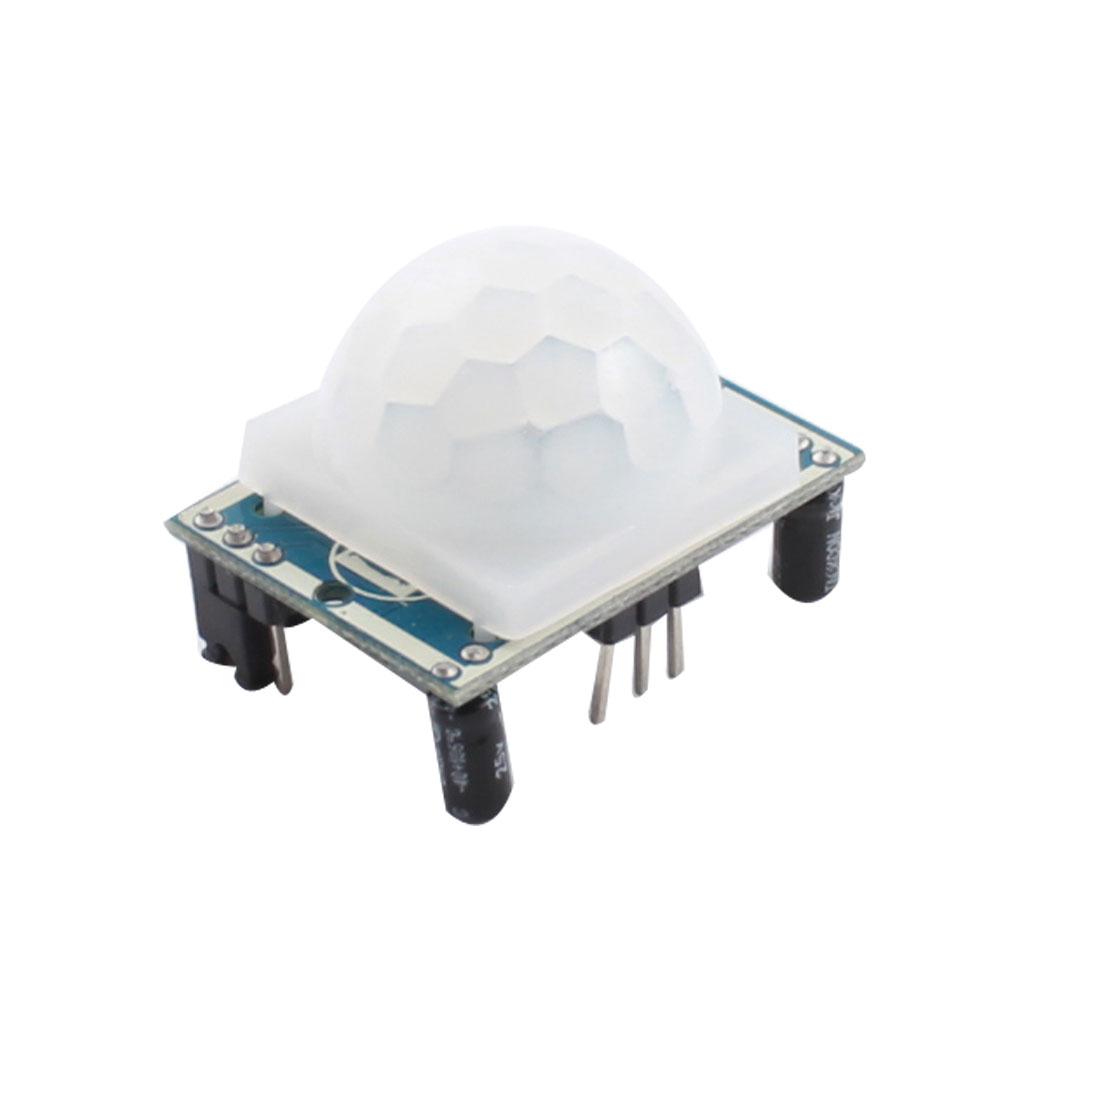 DC 5-20V Pyroelectric Infrared PIR Motion Sensor Detector Module Board HC-SR501